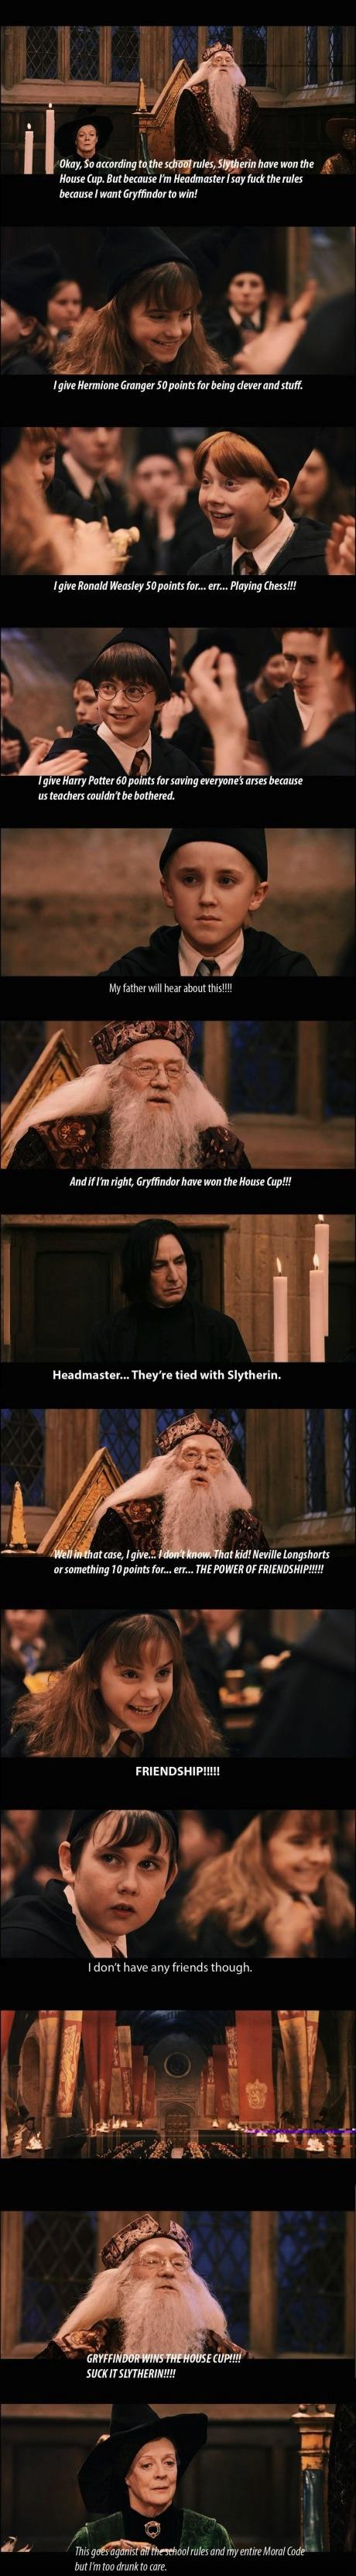 dumbledore house win